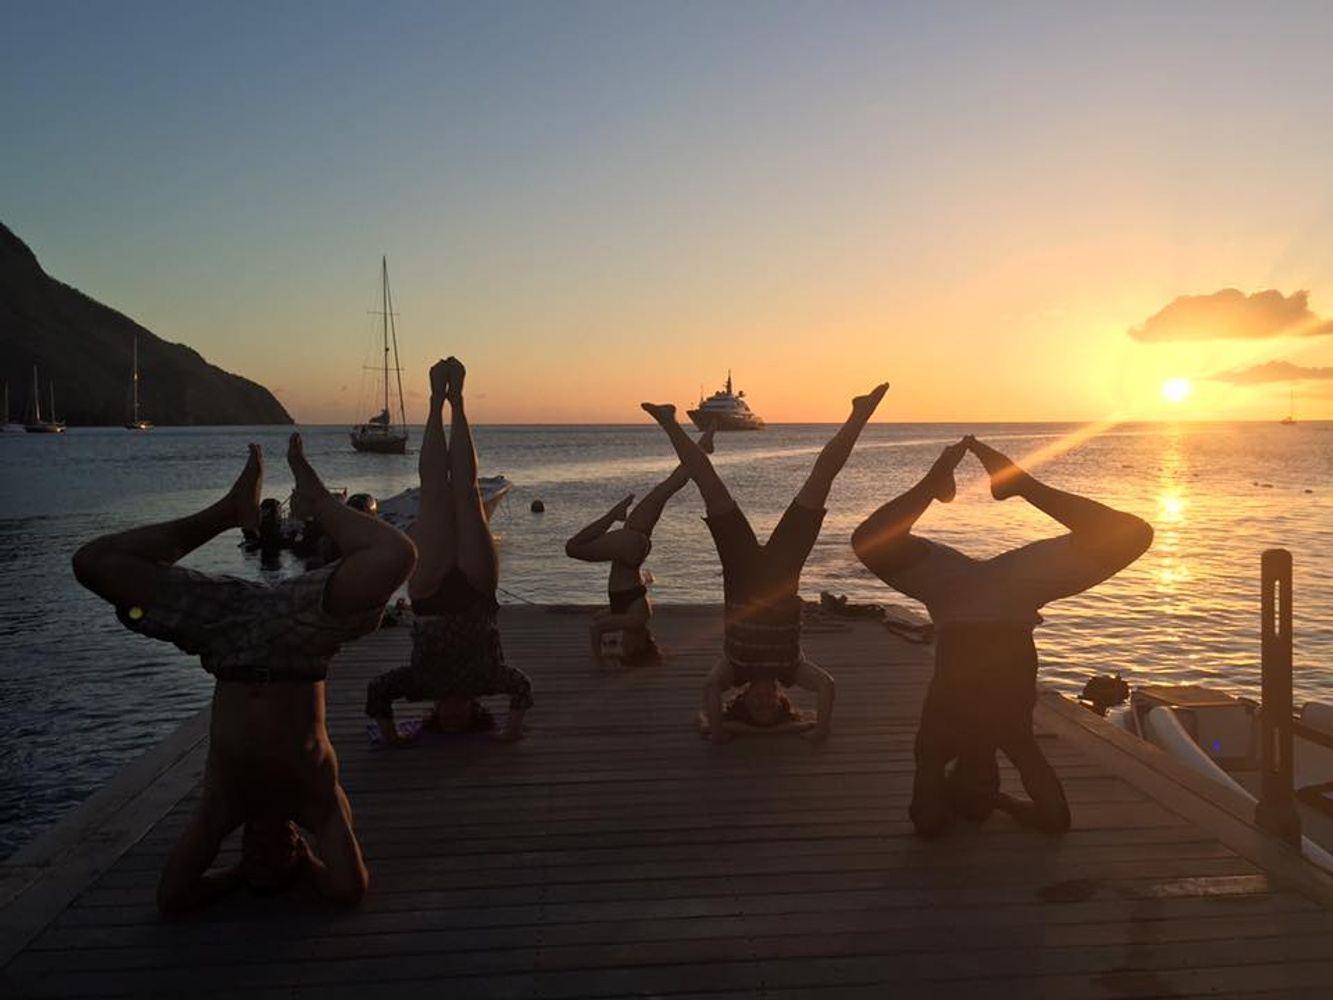 St. Lucia Yoga Getaway with Charlie The Yogi